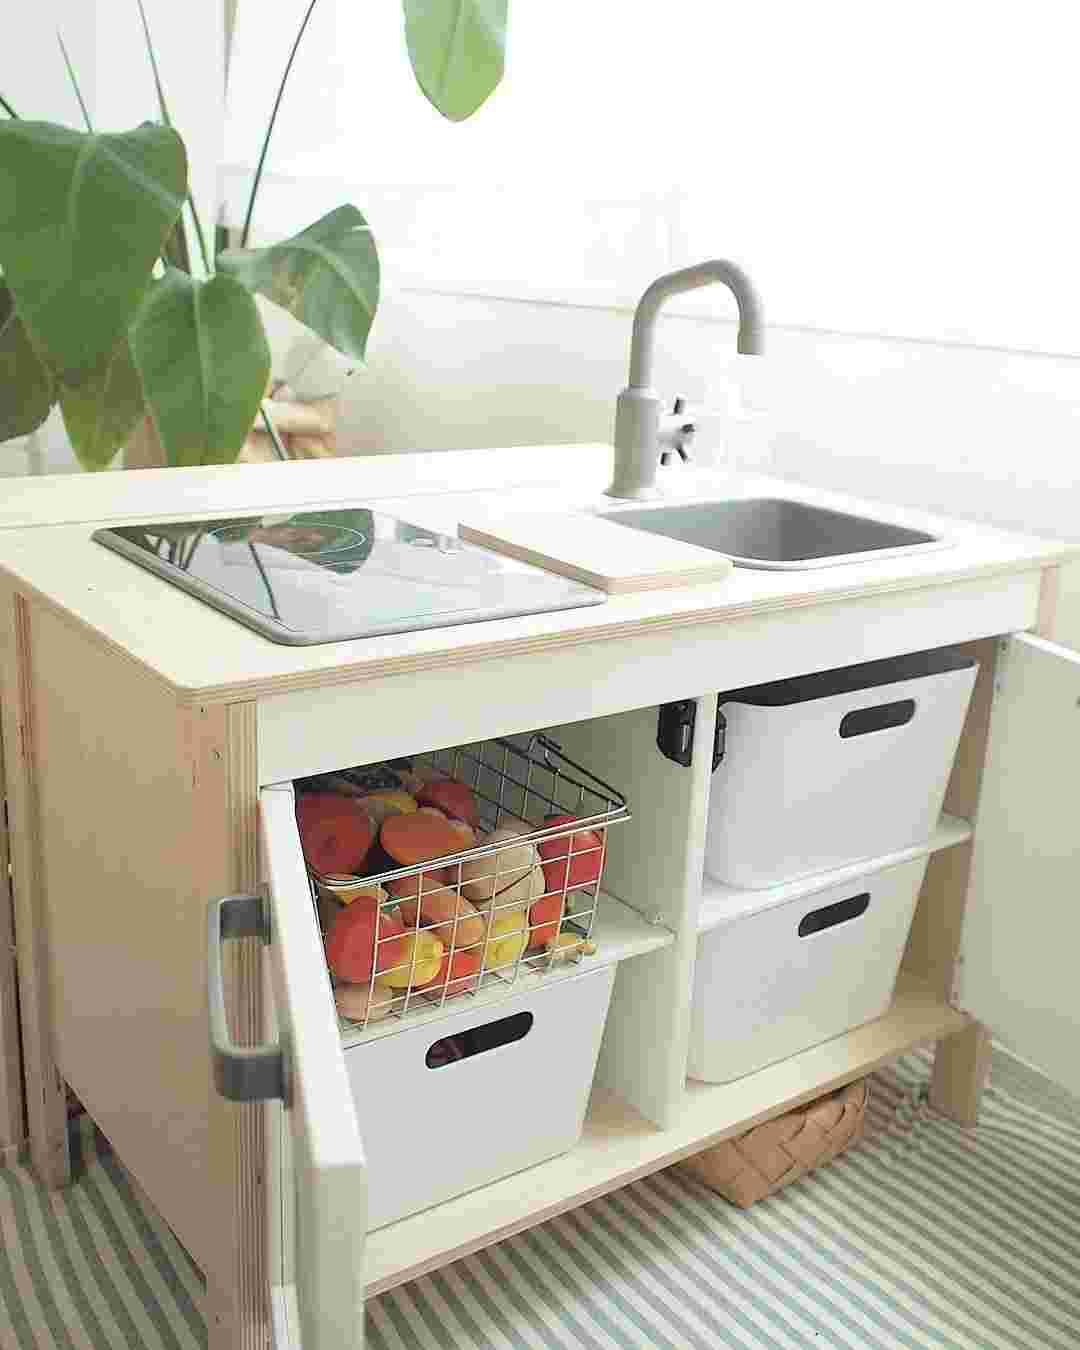 ikeaのままごとキッチンがおしゃれ!組み立て方法や収納法まで紹介 | お